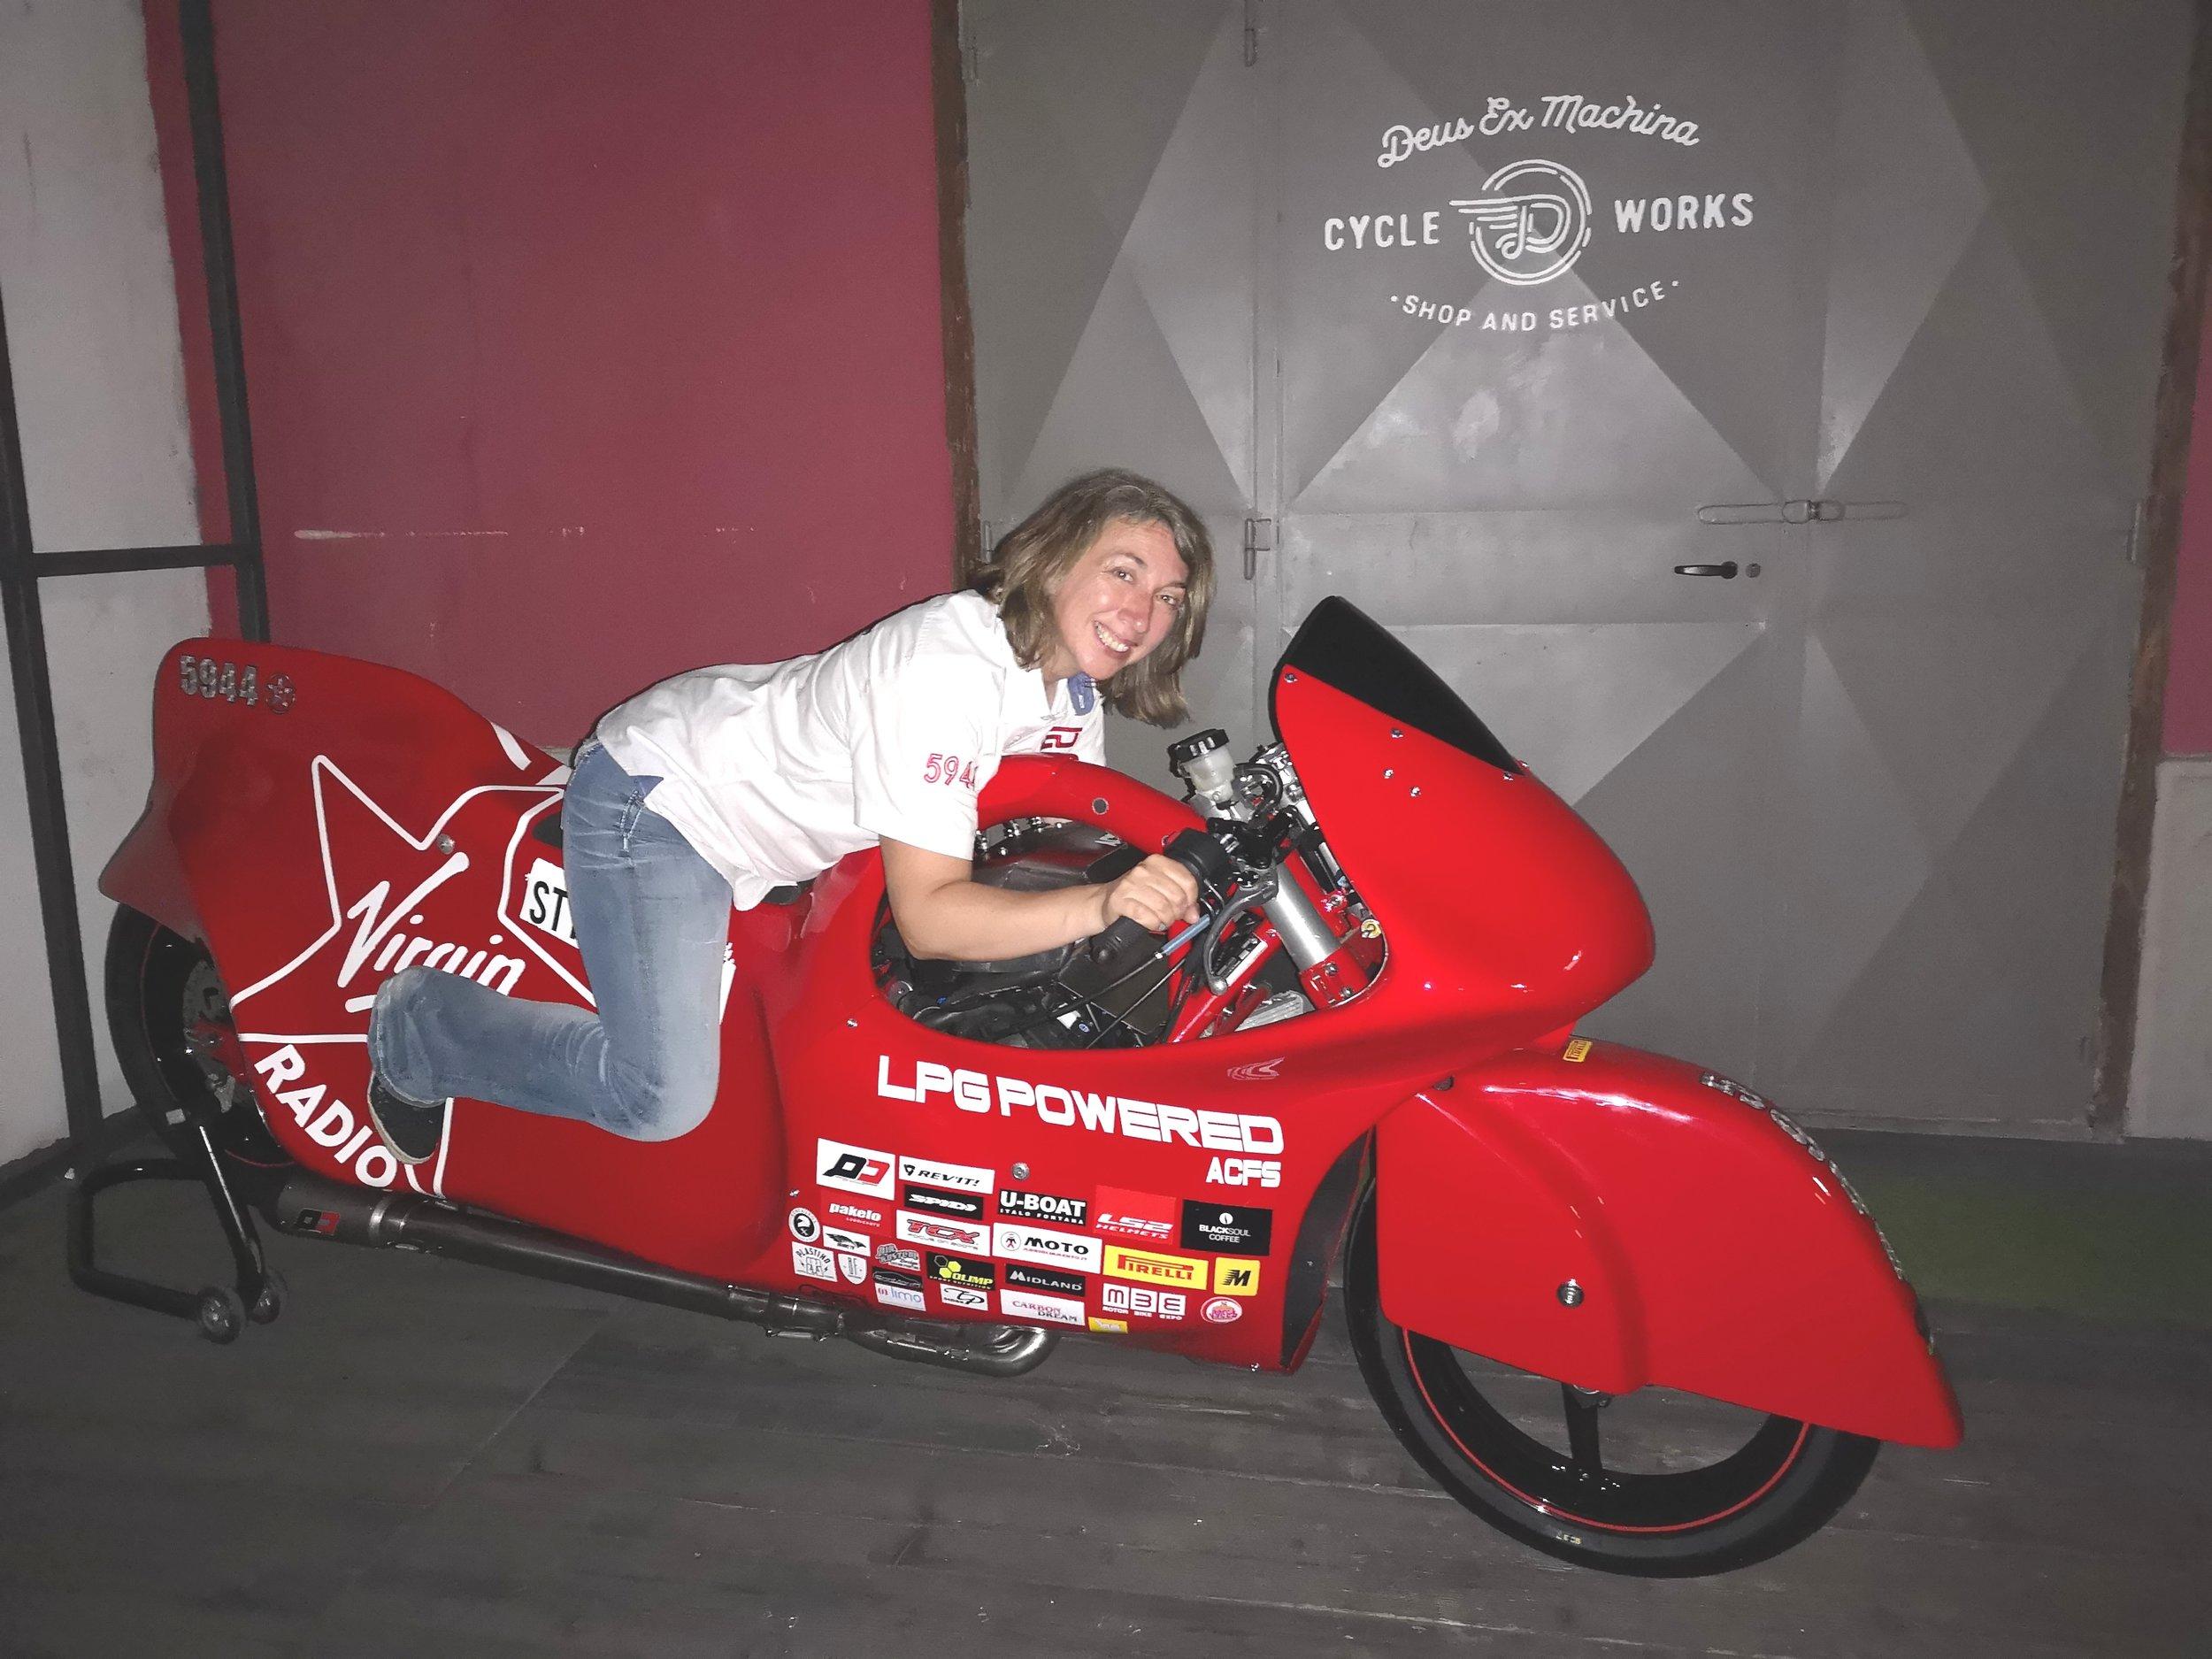 Louisa-Swaden-Adventure-Rider-Radio-Motorcycle-Podcast-10.jpg